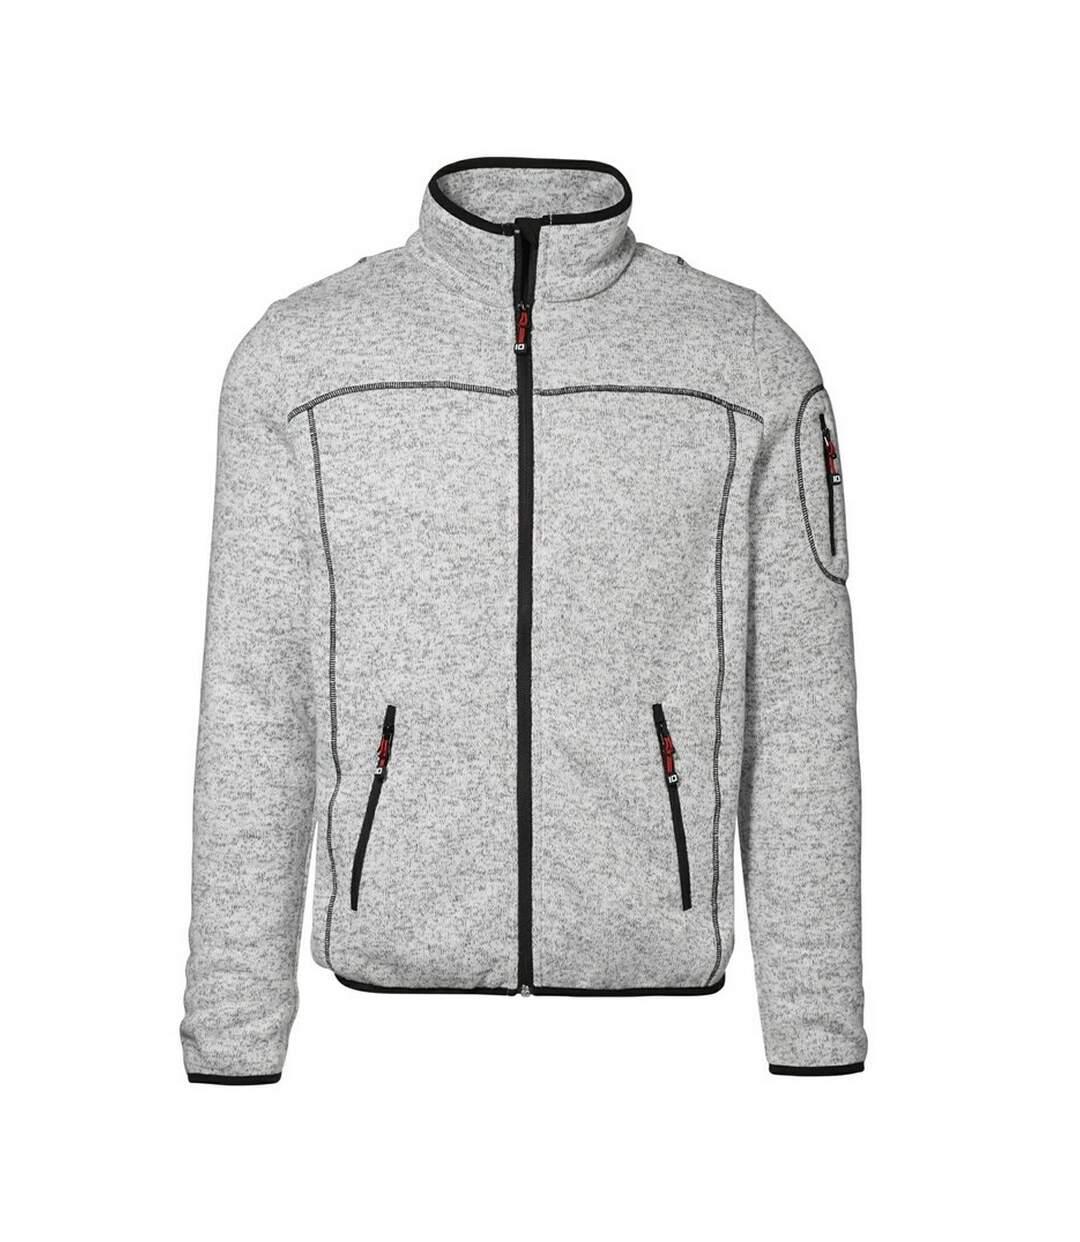 ID Mens Full Zip Regular Fitting Melange Knit Fleece Jacket (Grey melange) - UTID315